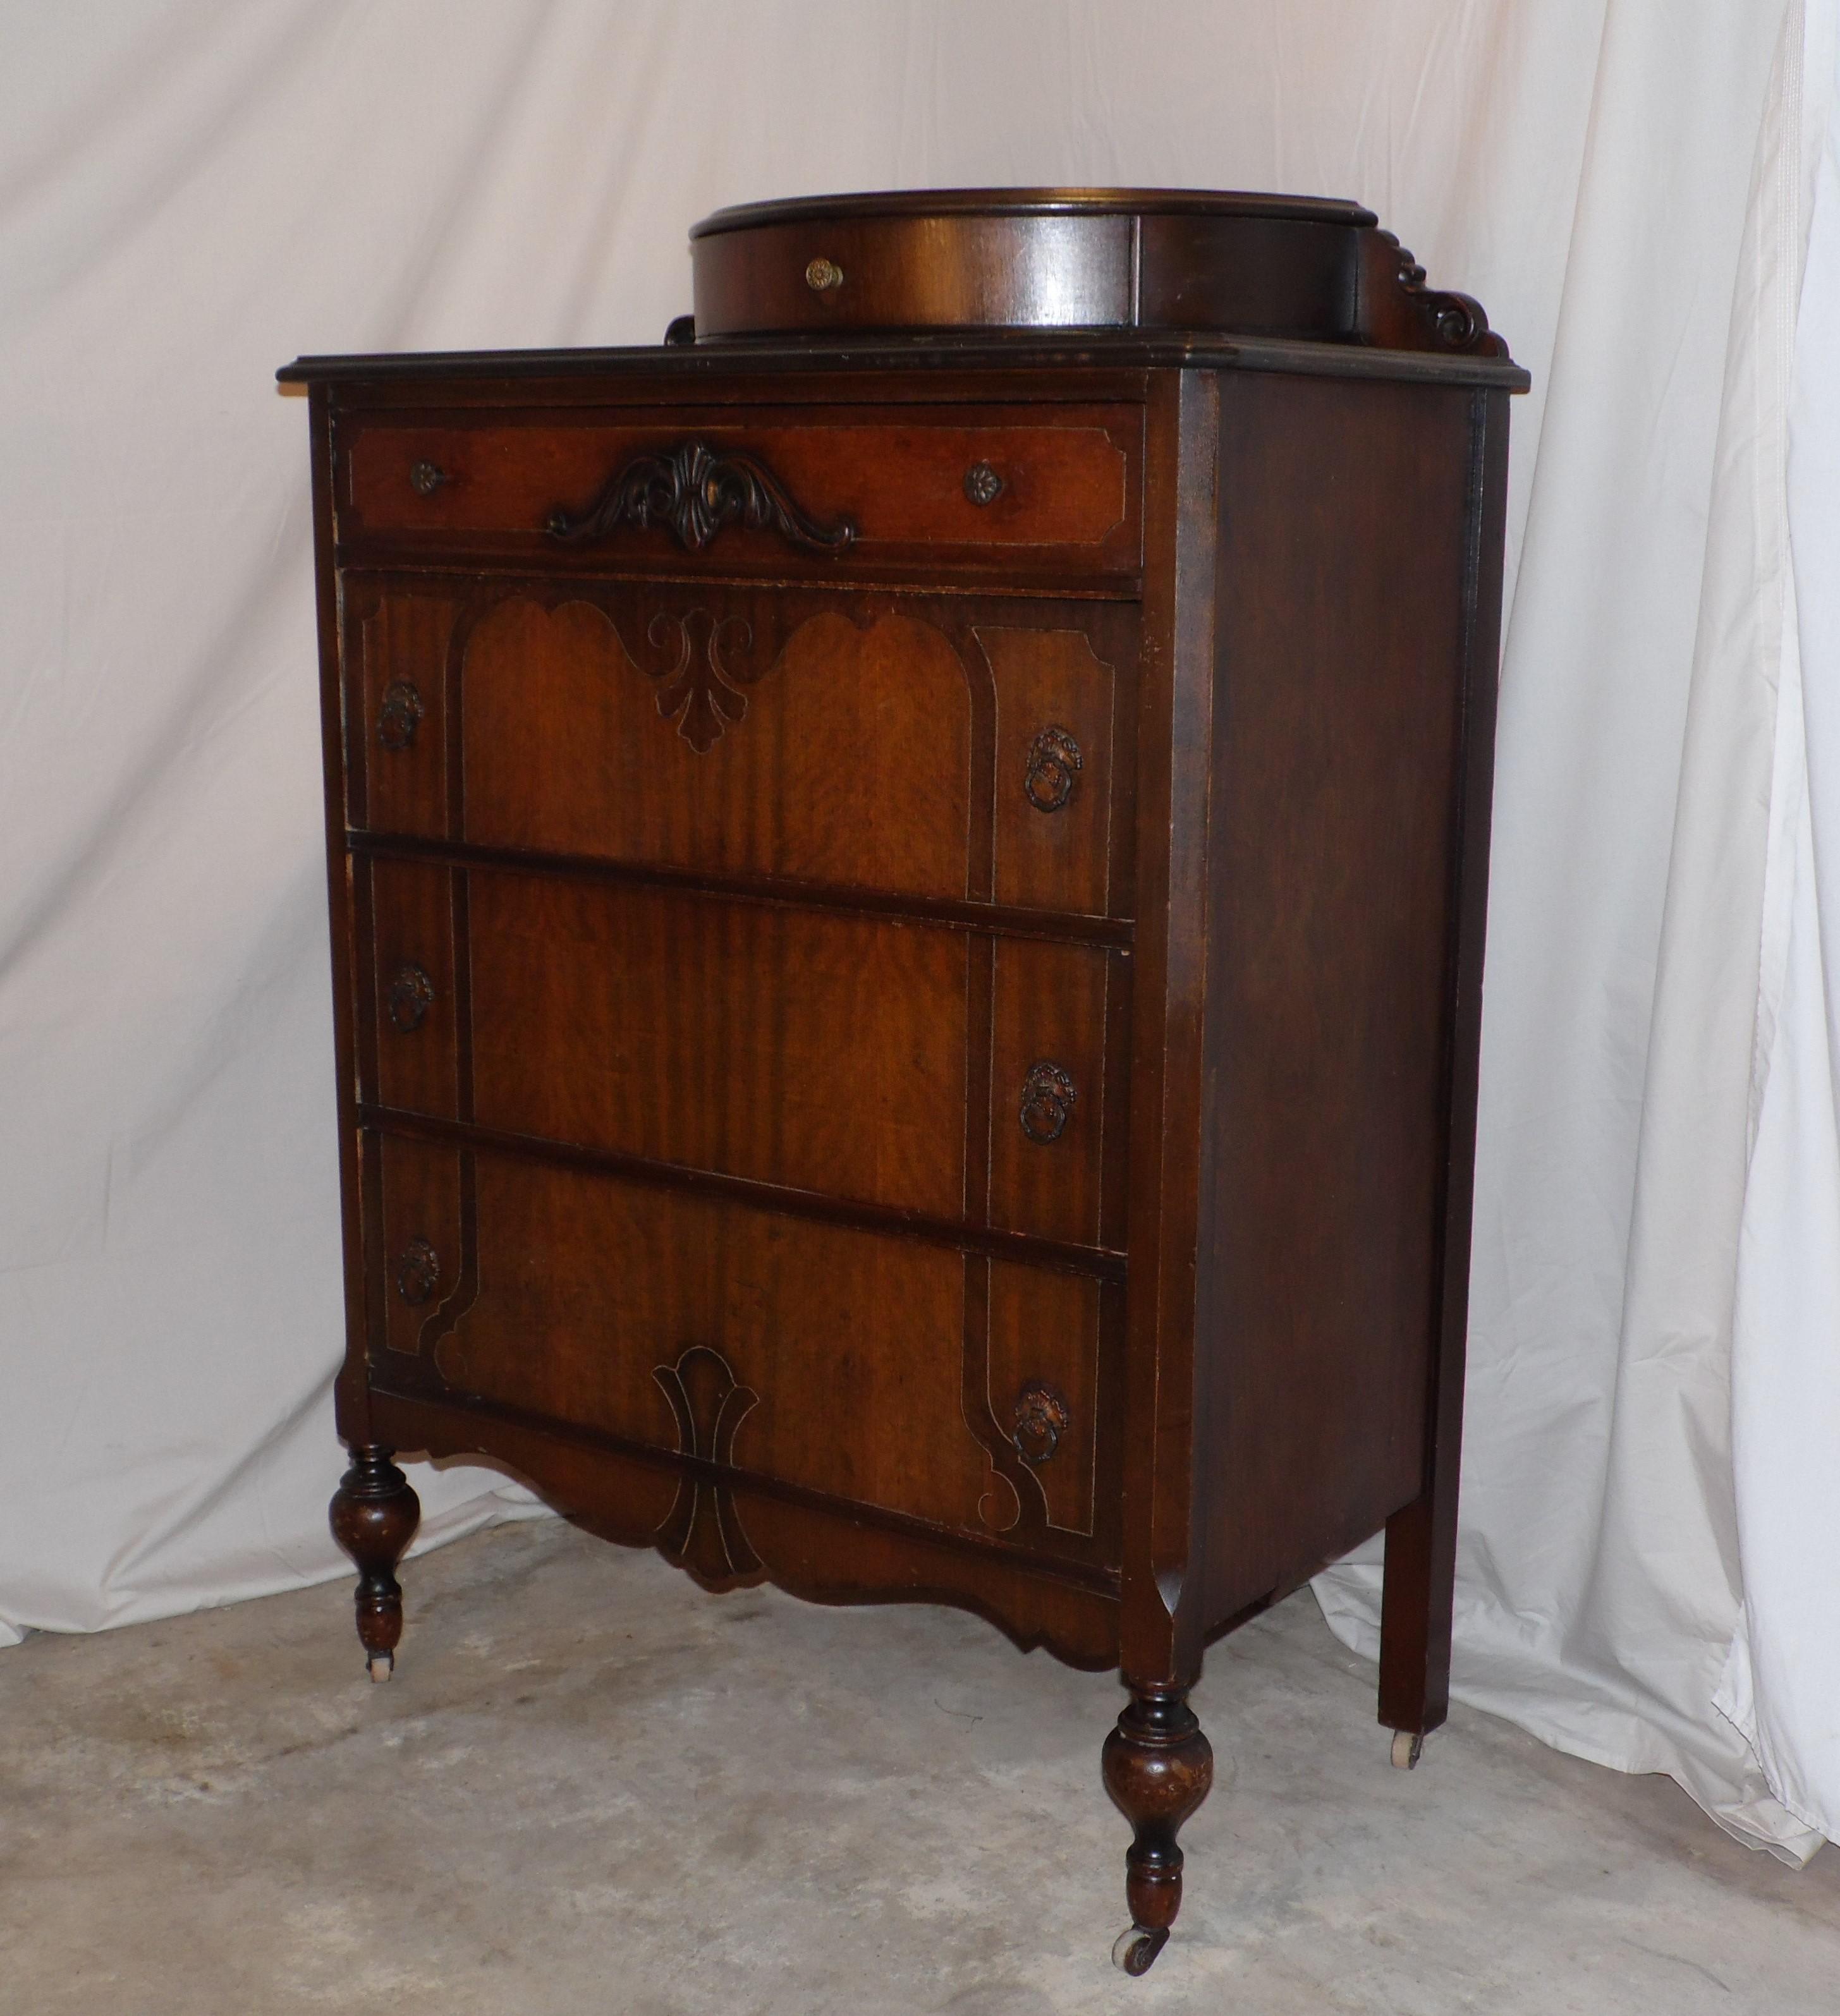 1920s antique art deco walnut dresser bureau chest of drawers demilune top image 12 of